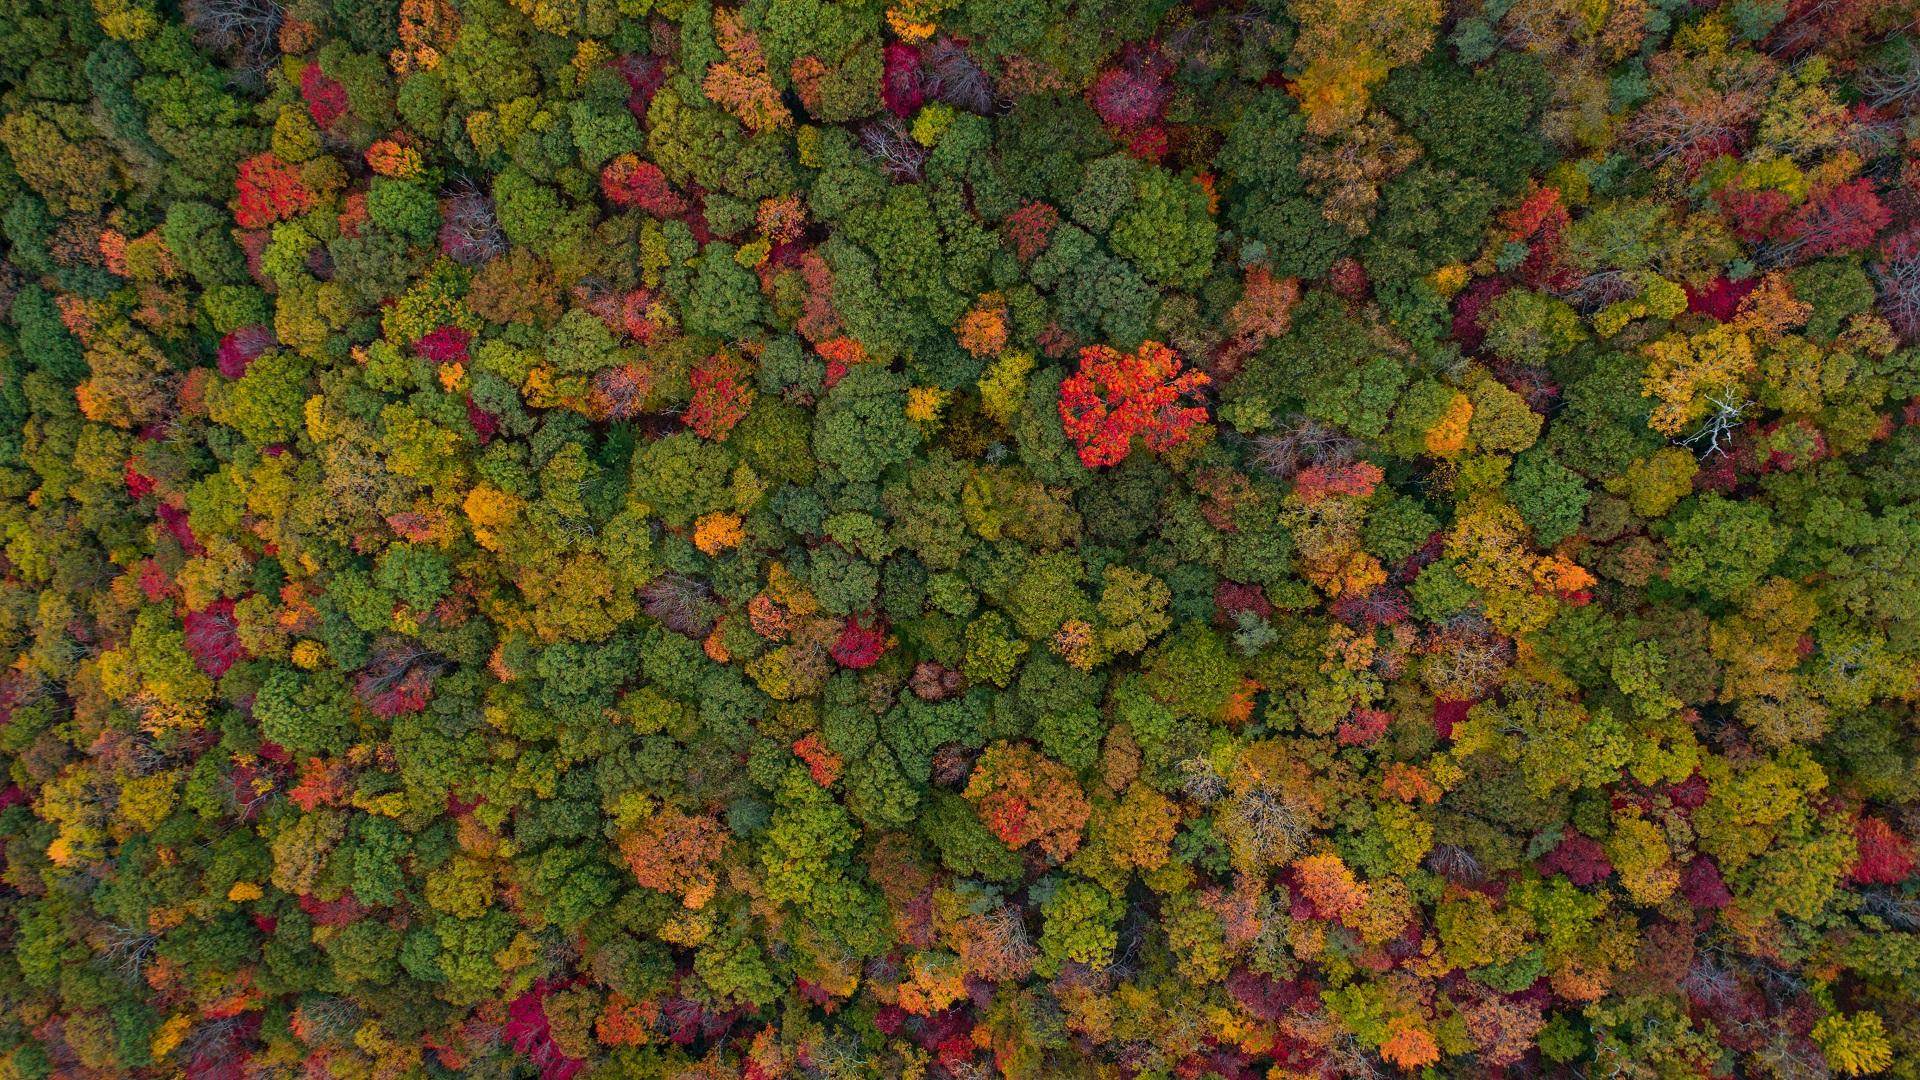 Vista aérea de un bosque. Foto de Nathan Anderson / Unsplash